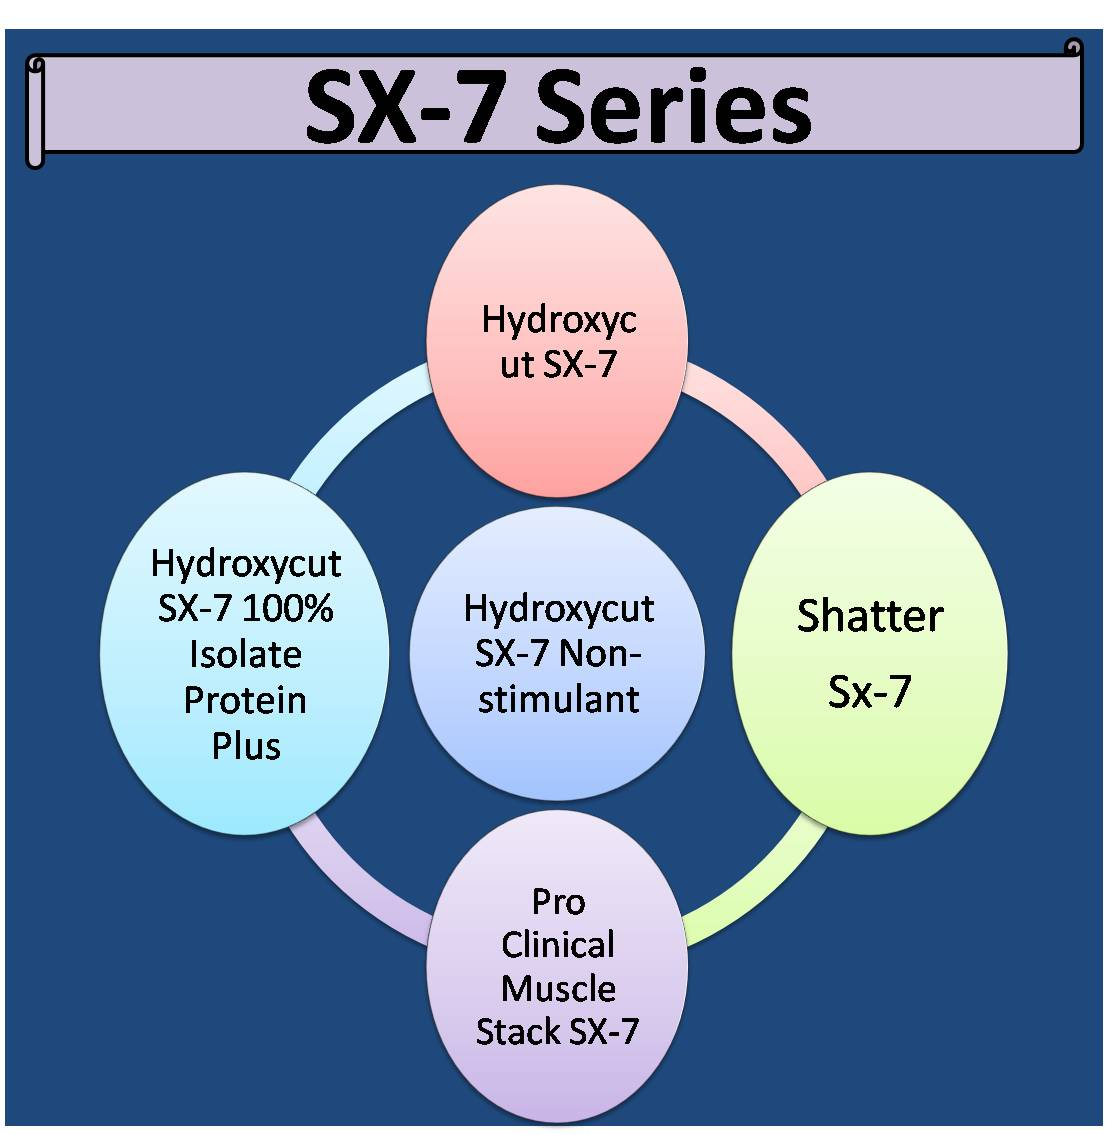 SX-7 Series